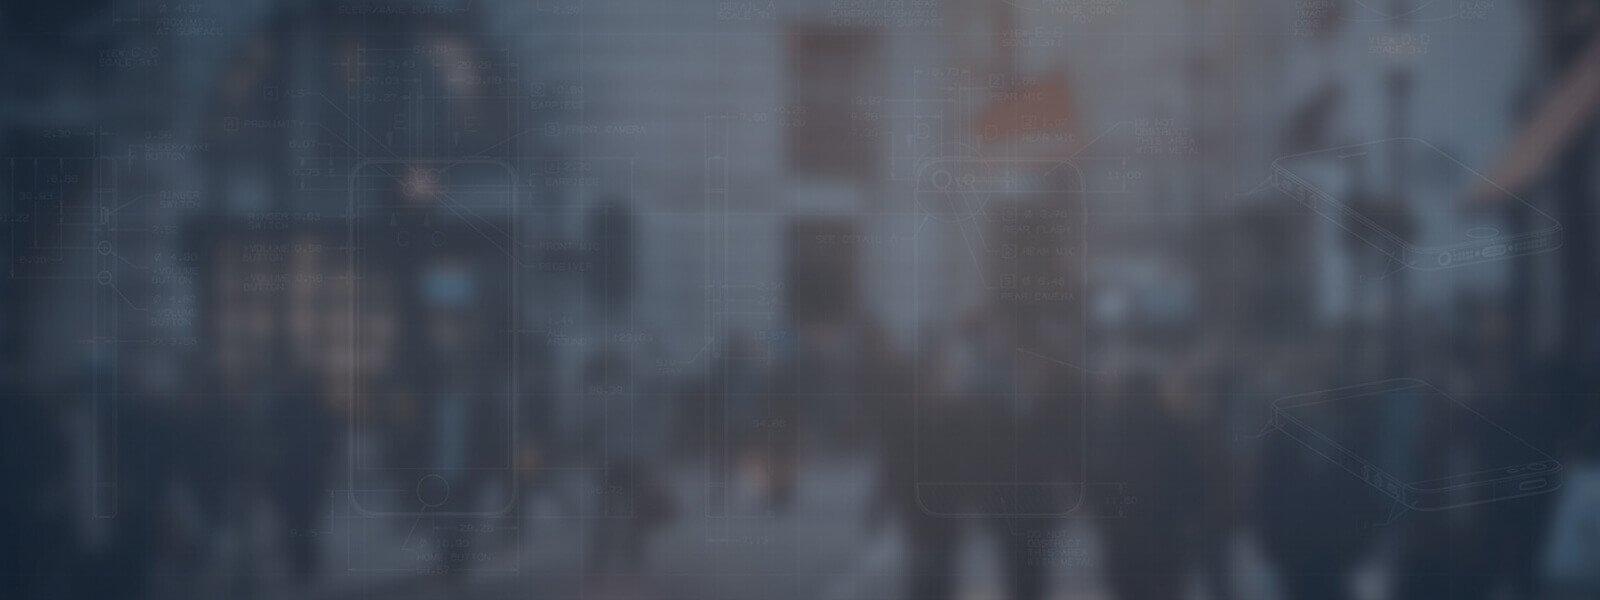 Mobile App Background